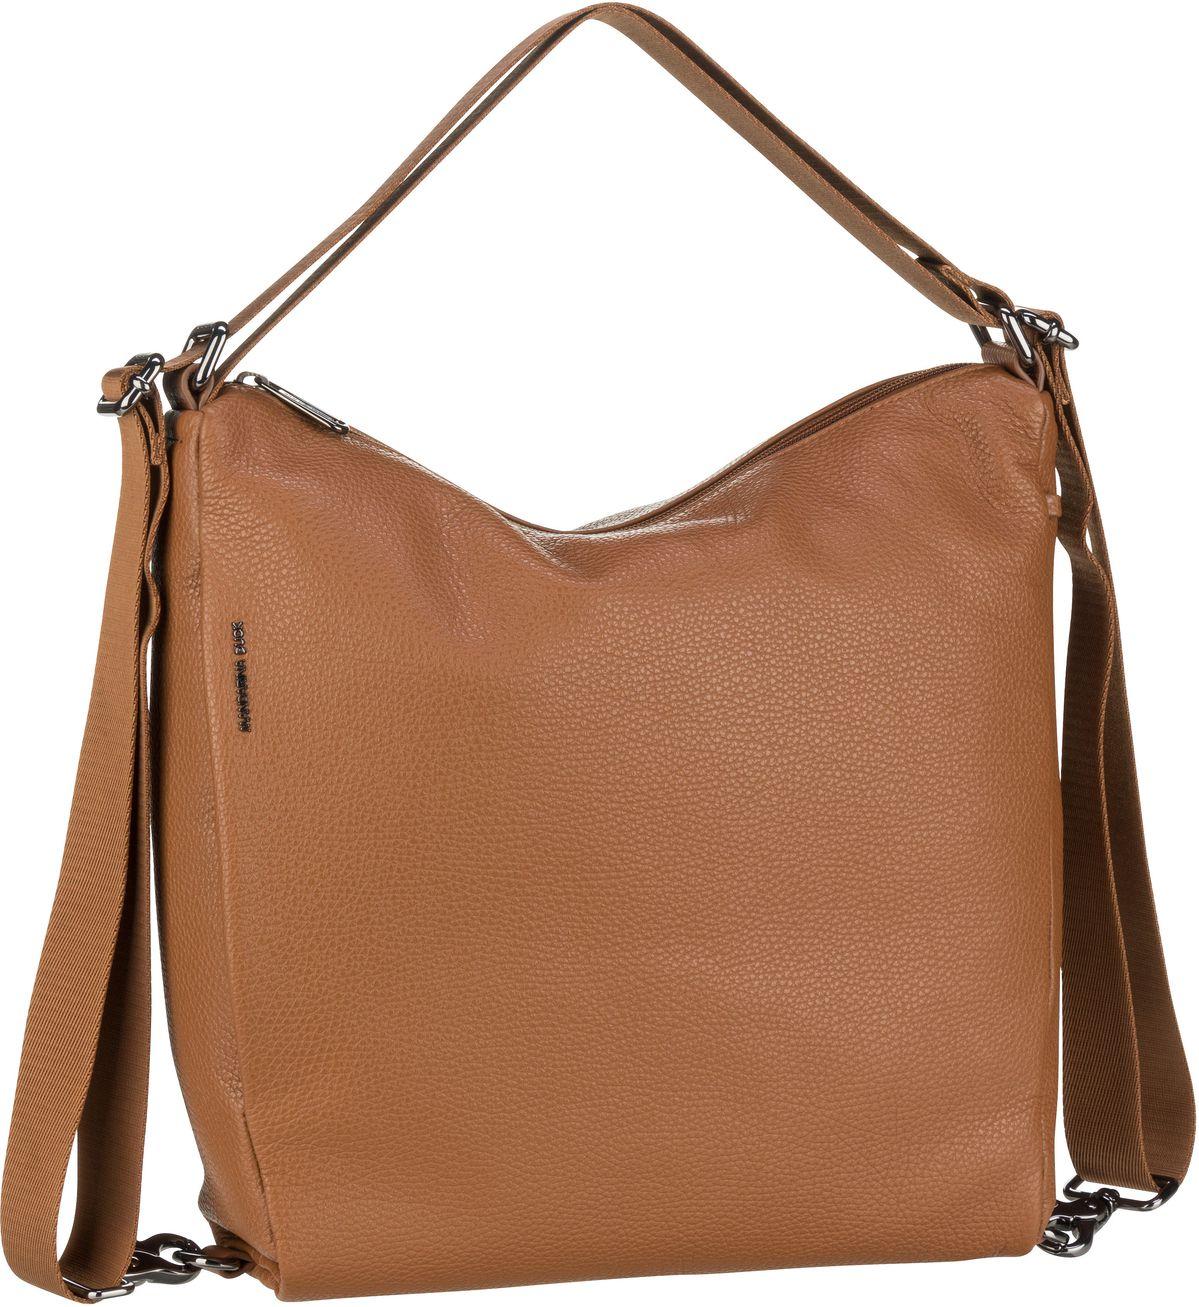 mandarina duck -  Handtasche Mellow Leather Hobo Backpack FZT72 Indian Tan